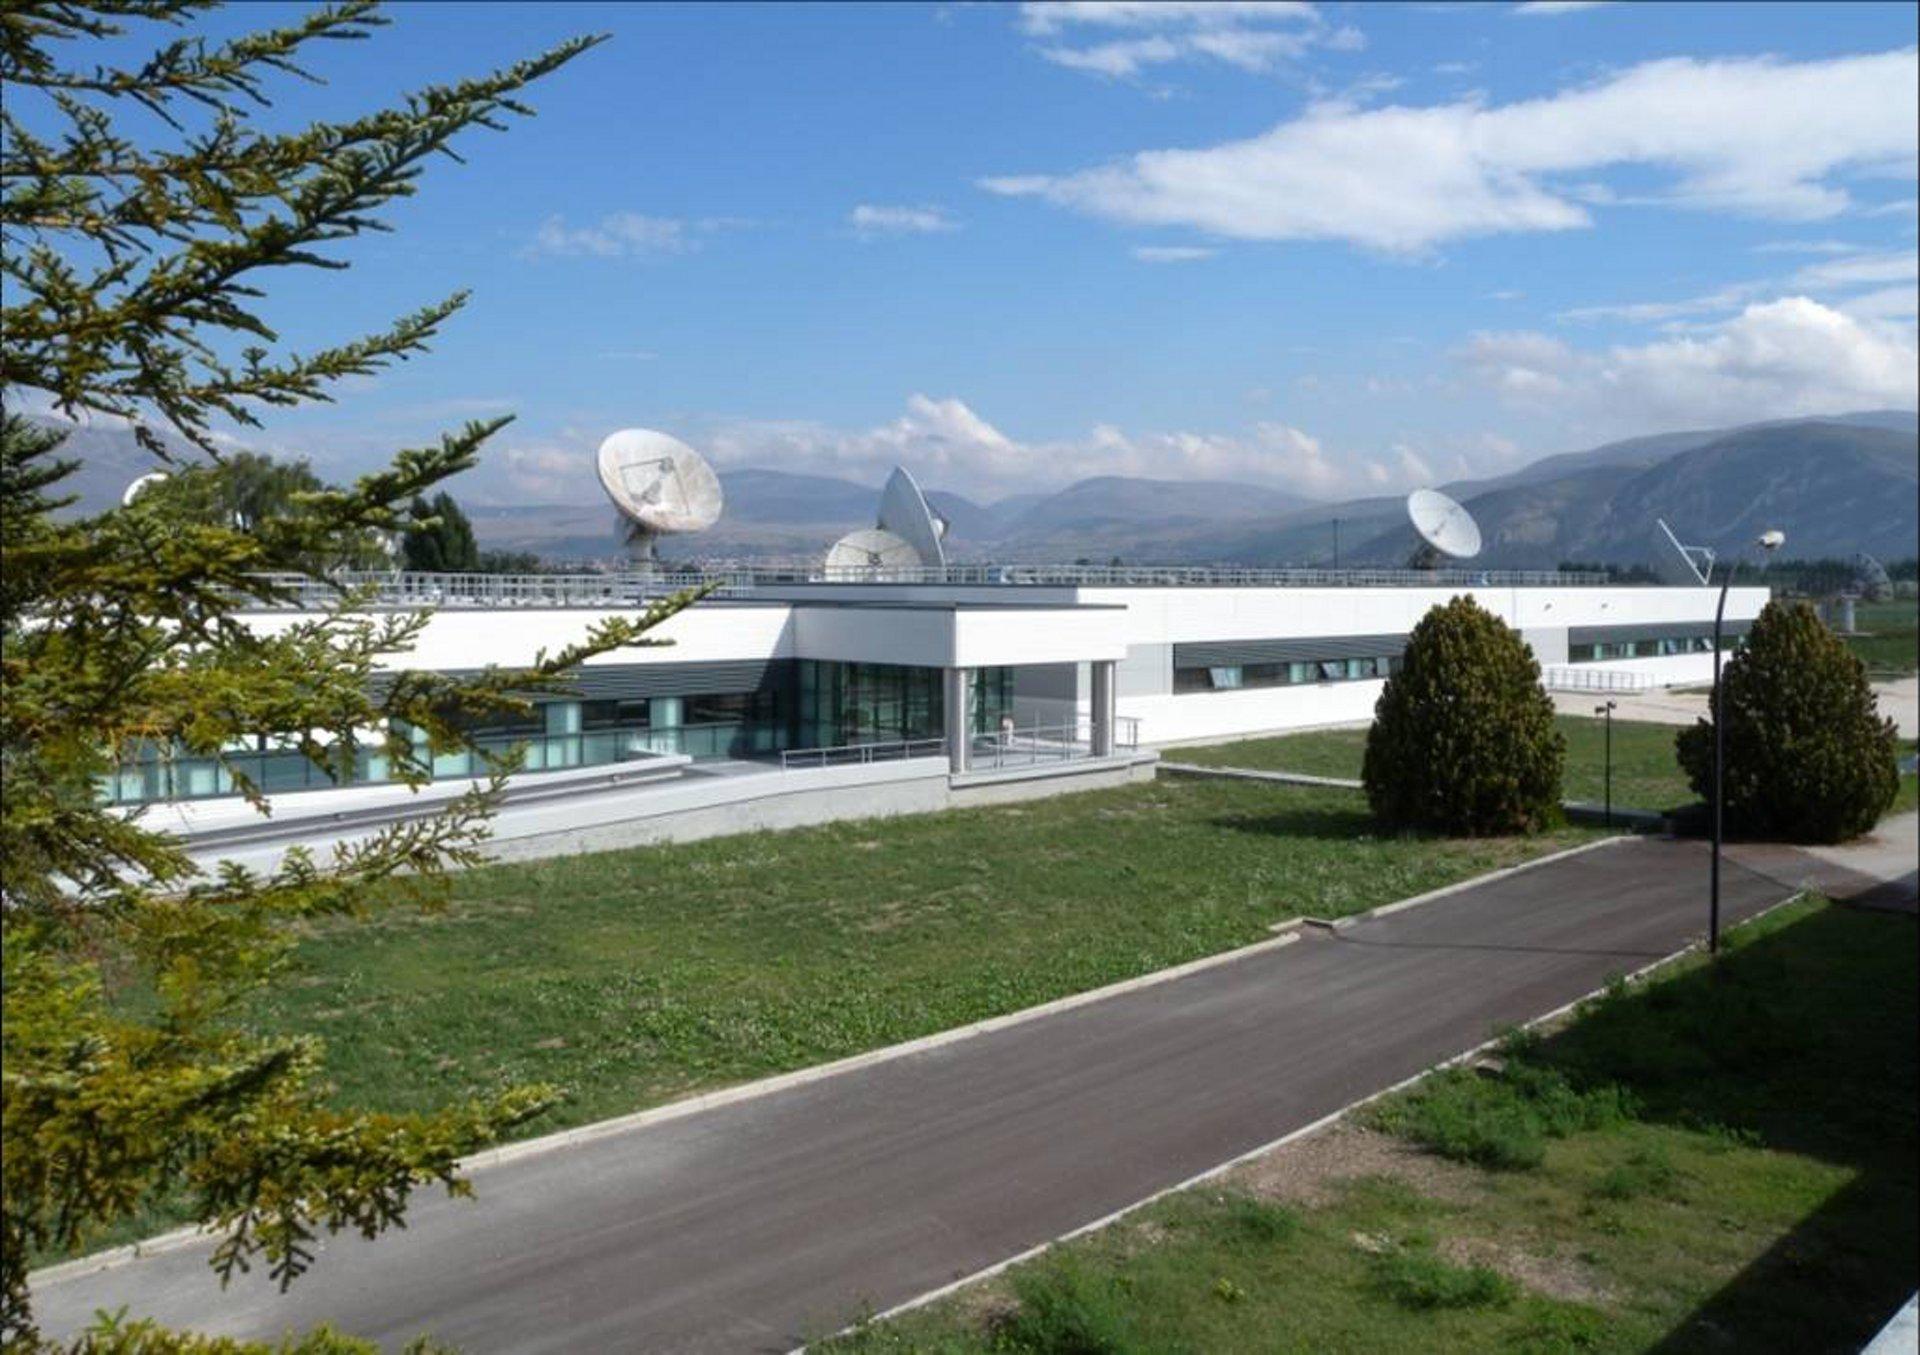 Galileo Ground Control Center in Fucino, Italy